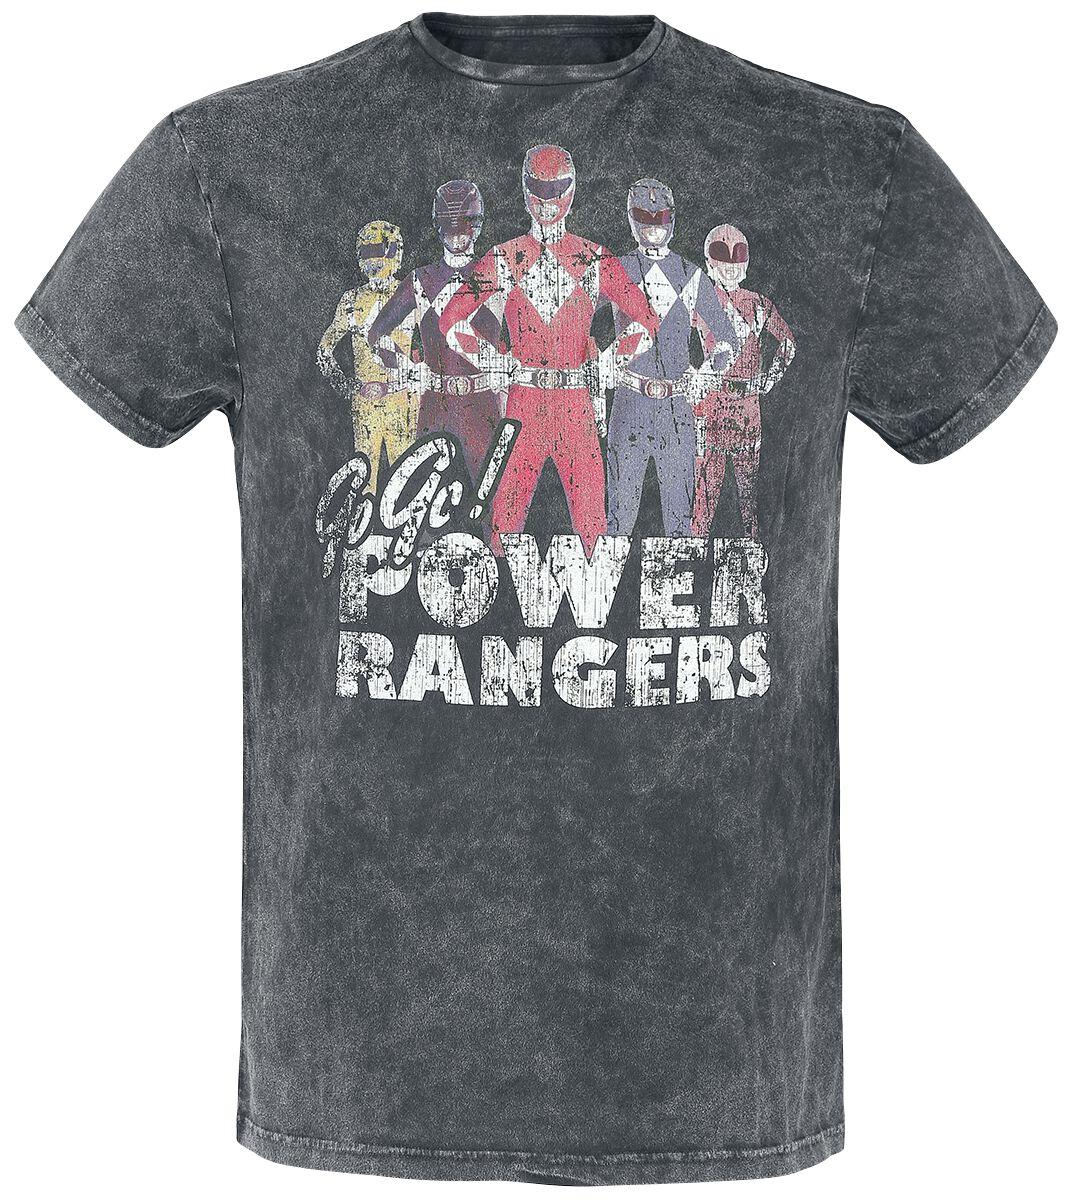 Merch dla Fanów - Koszulki - T-Shirt Power Rangers Go Go Power Rangers T-Shirt ciemnoszary - 351263